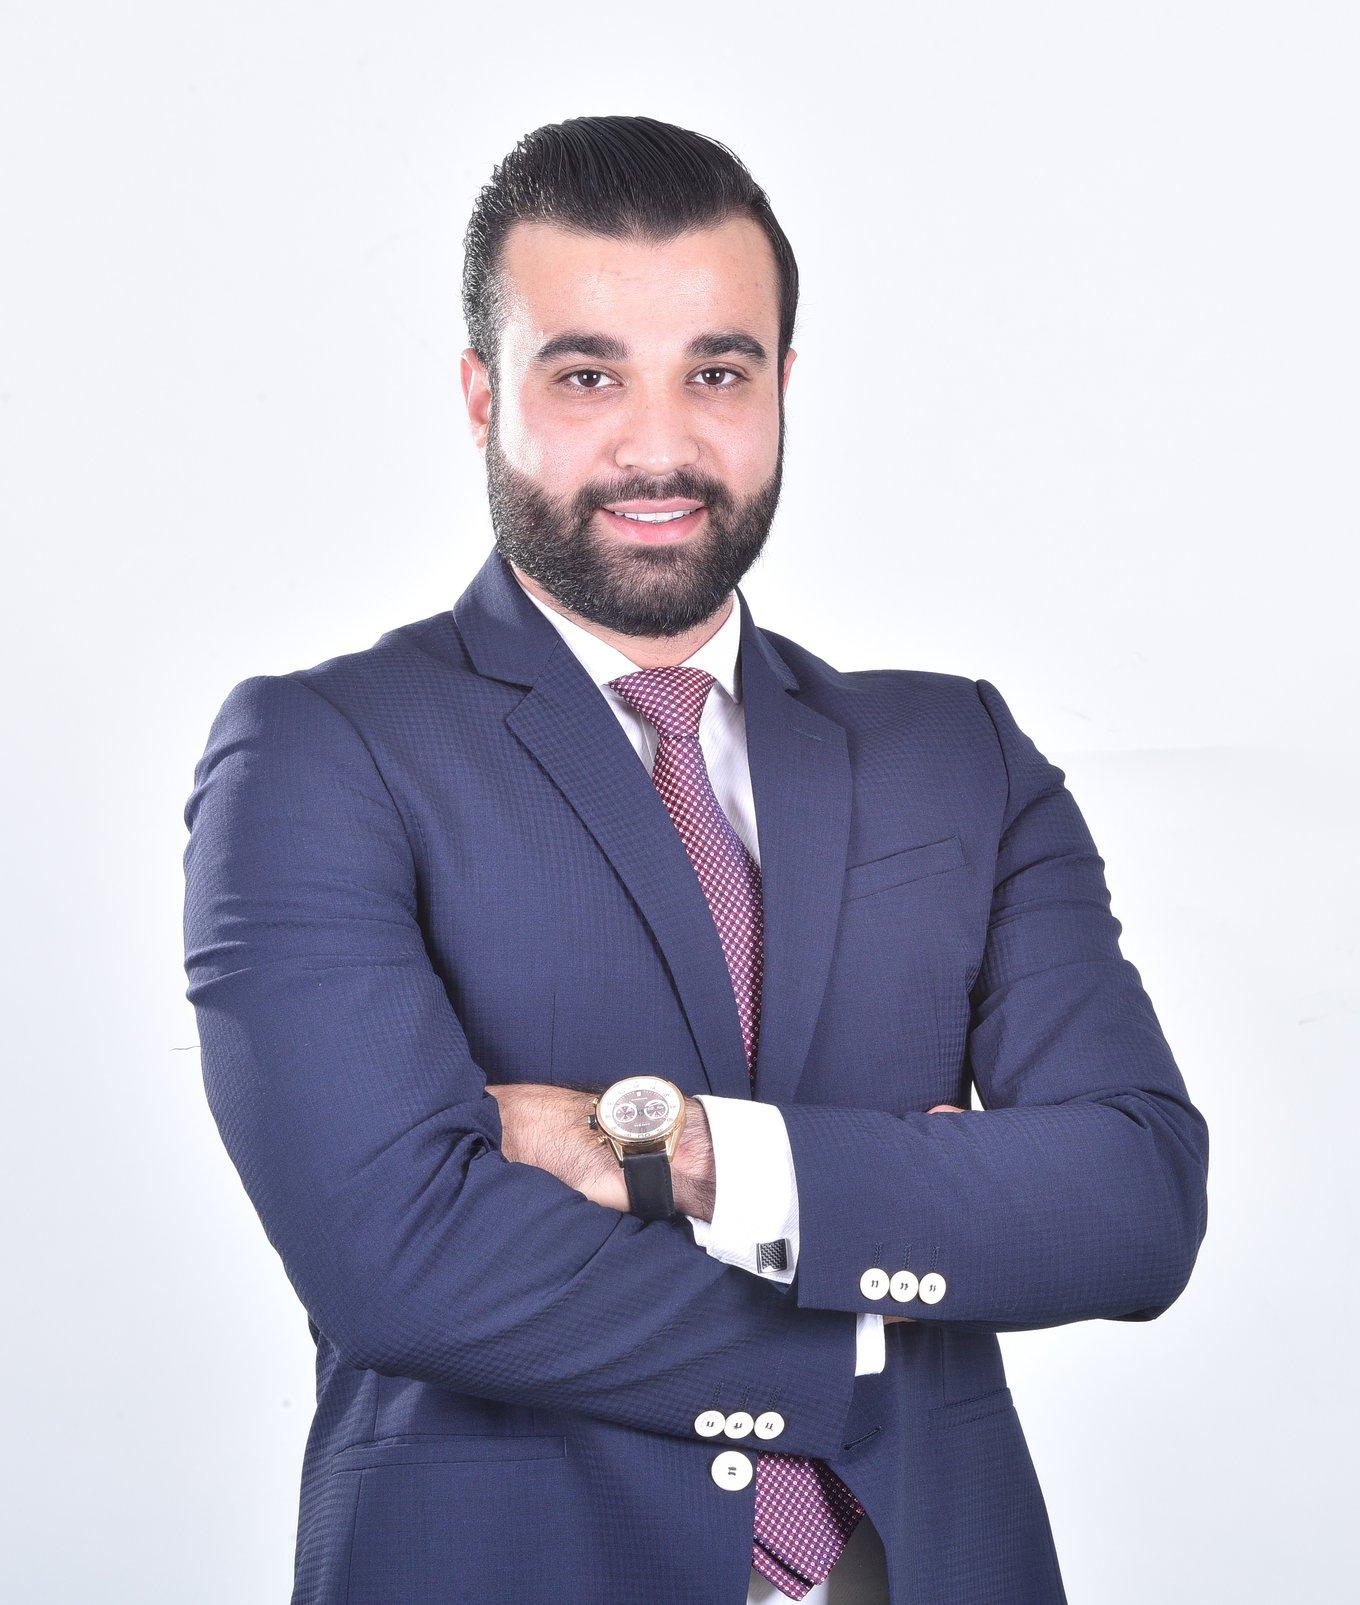 Photo of Fouad Maksoud